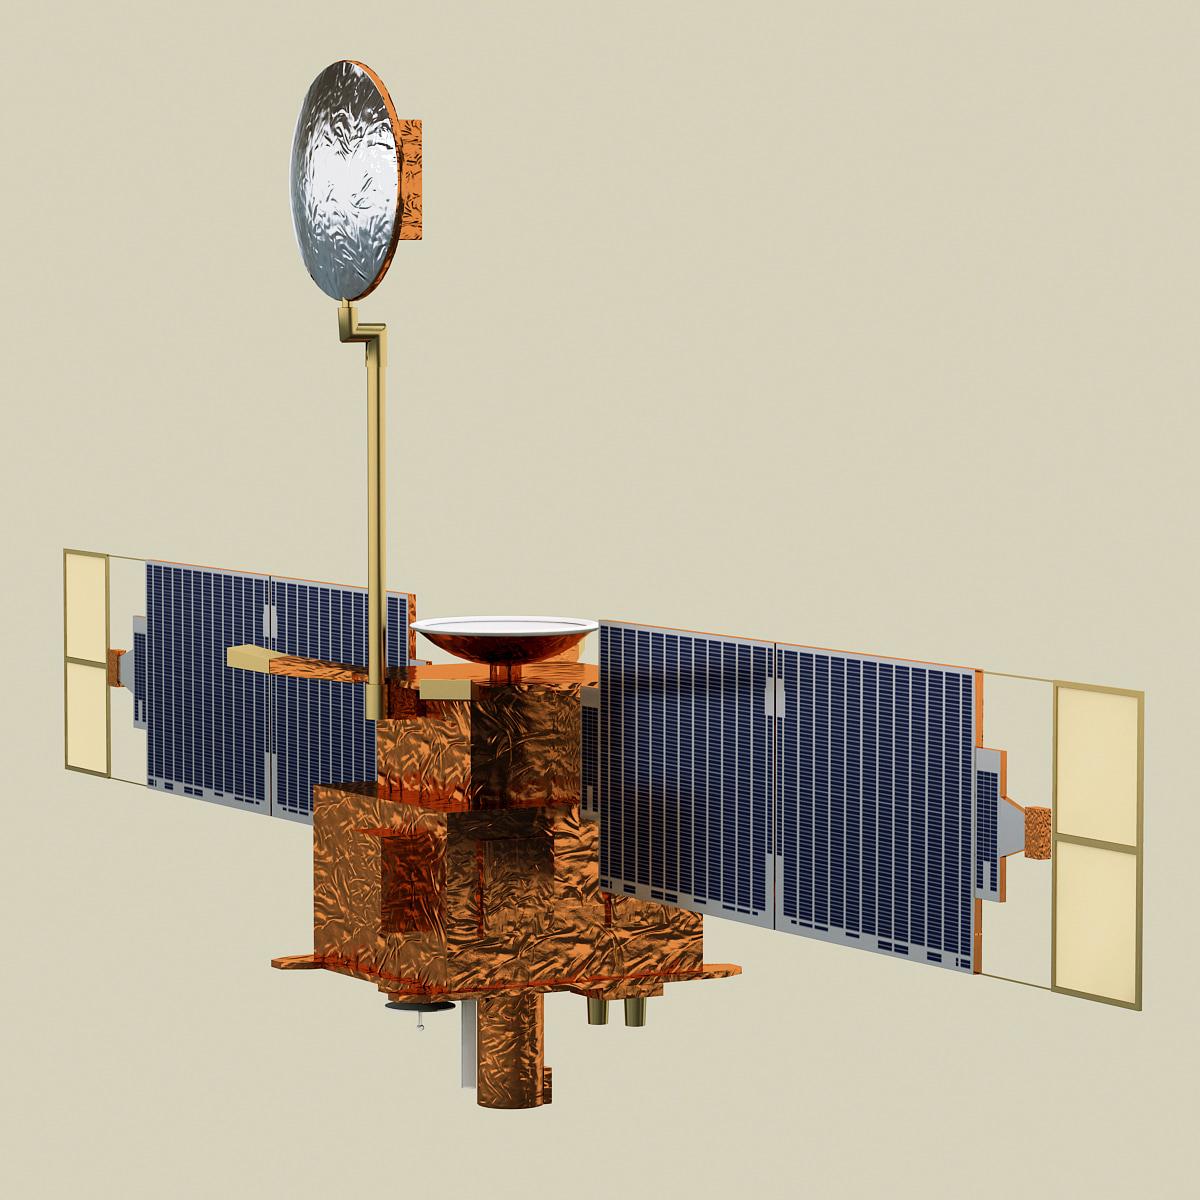 Mars_Global_Surveyor_Satellite_001.jpg